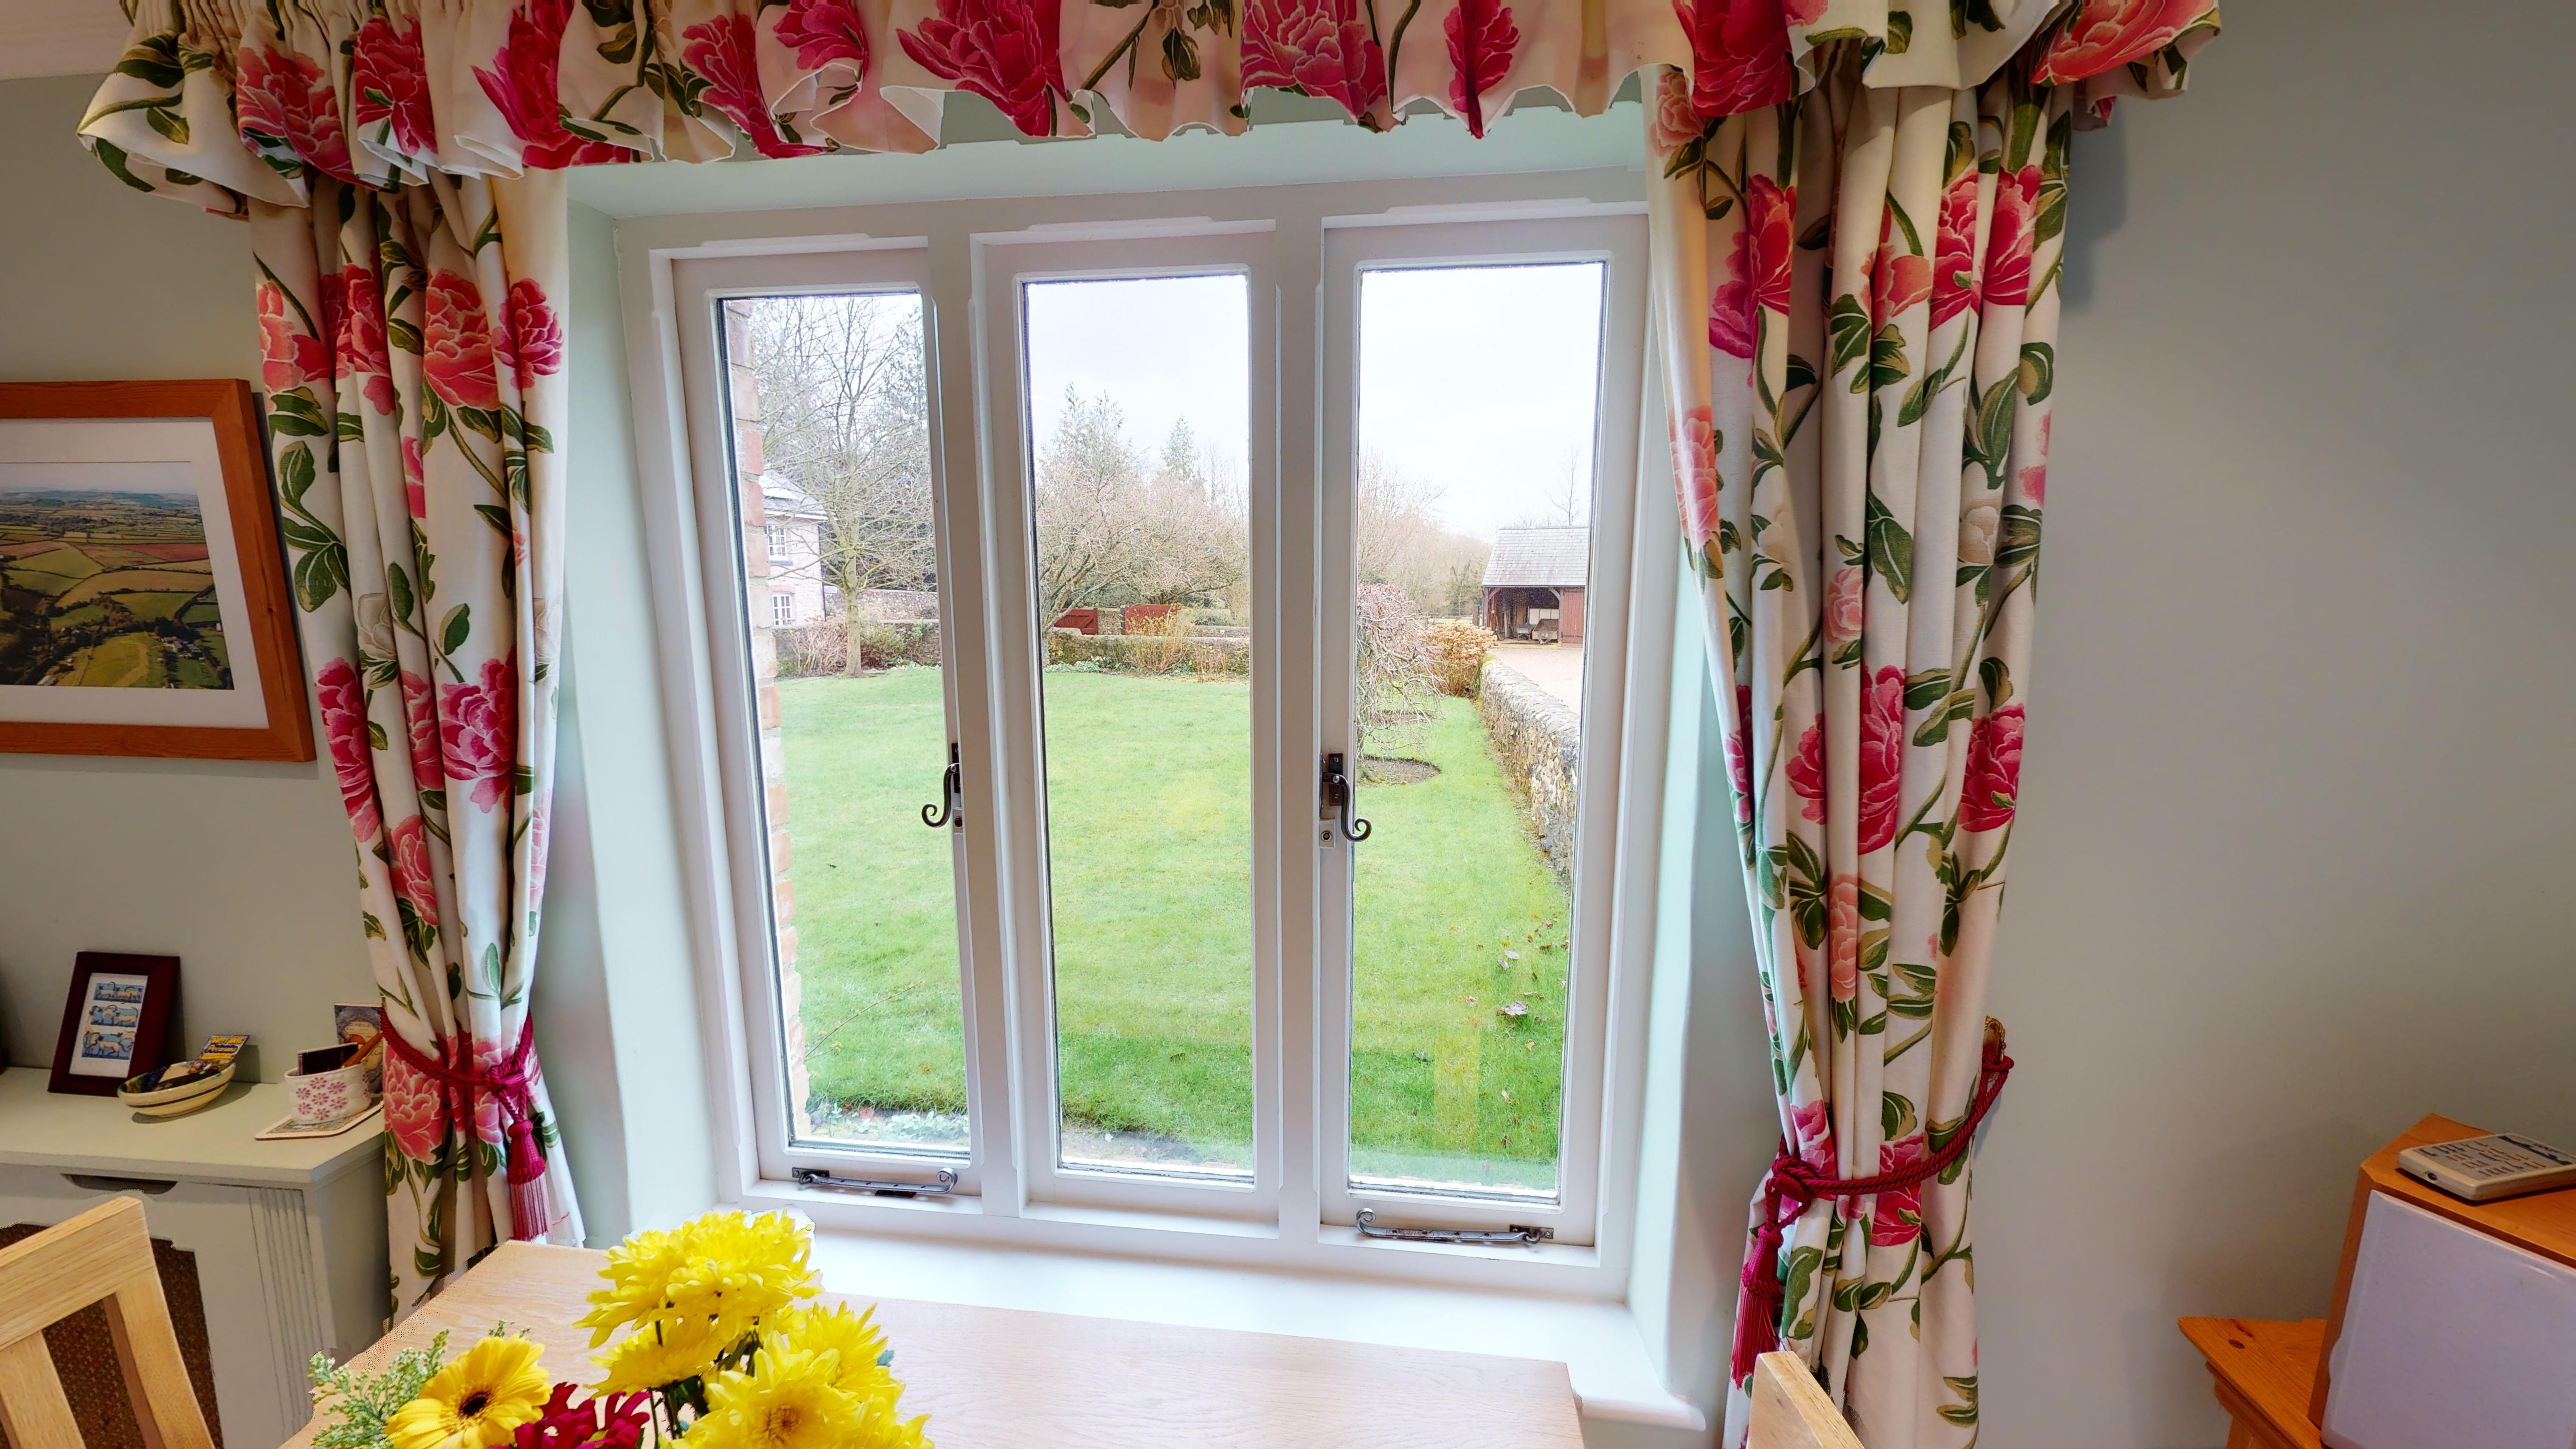 Coxes Cottage 03032020 191502 Window